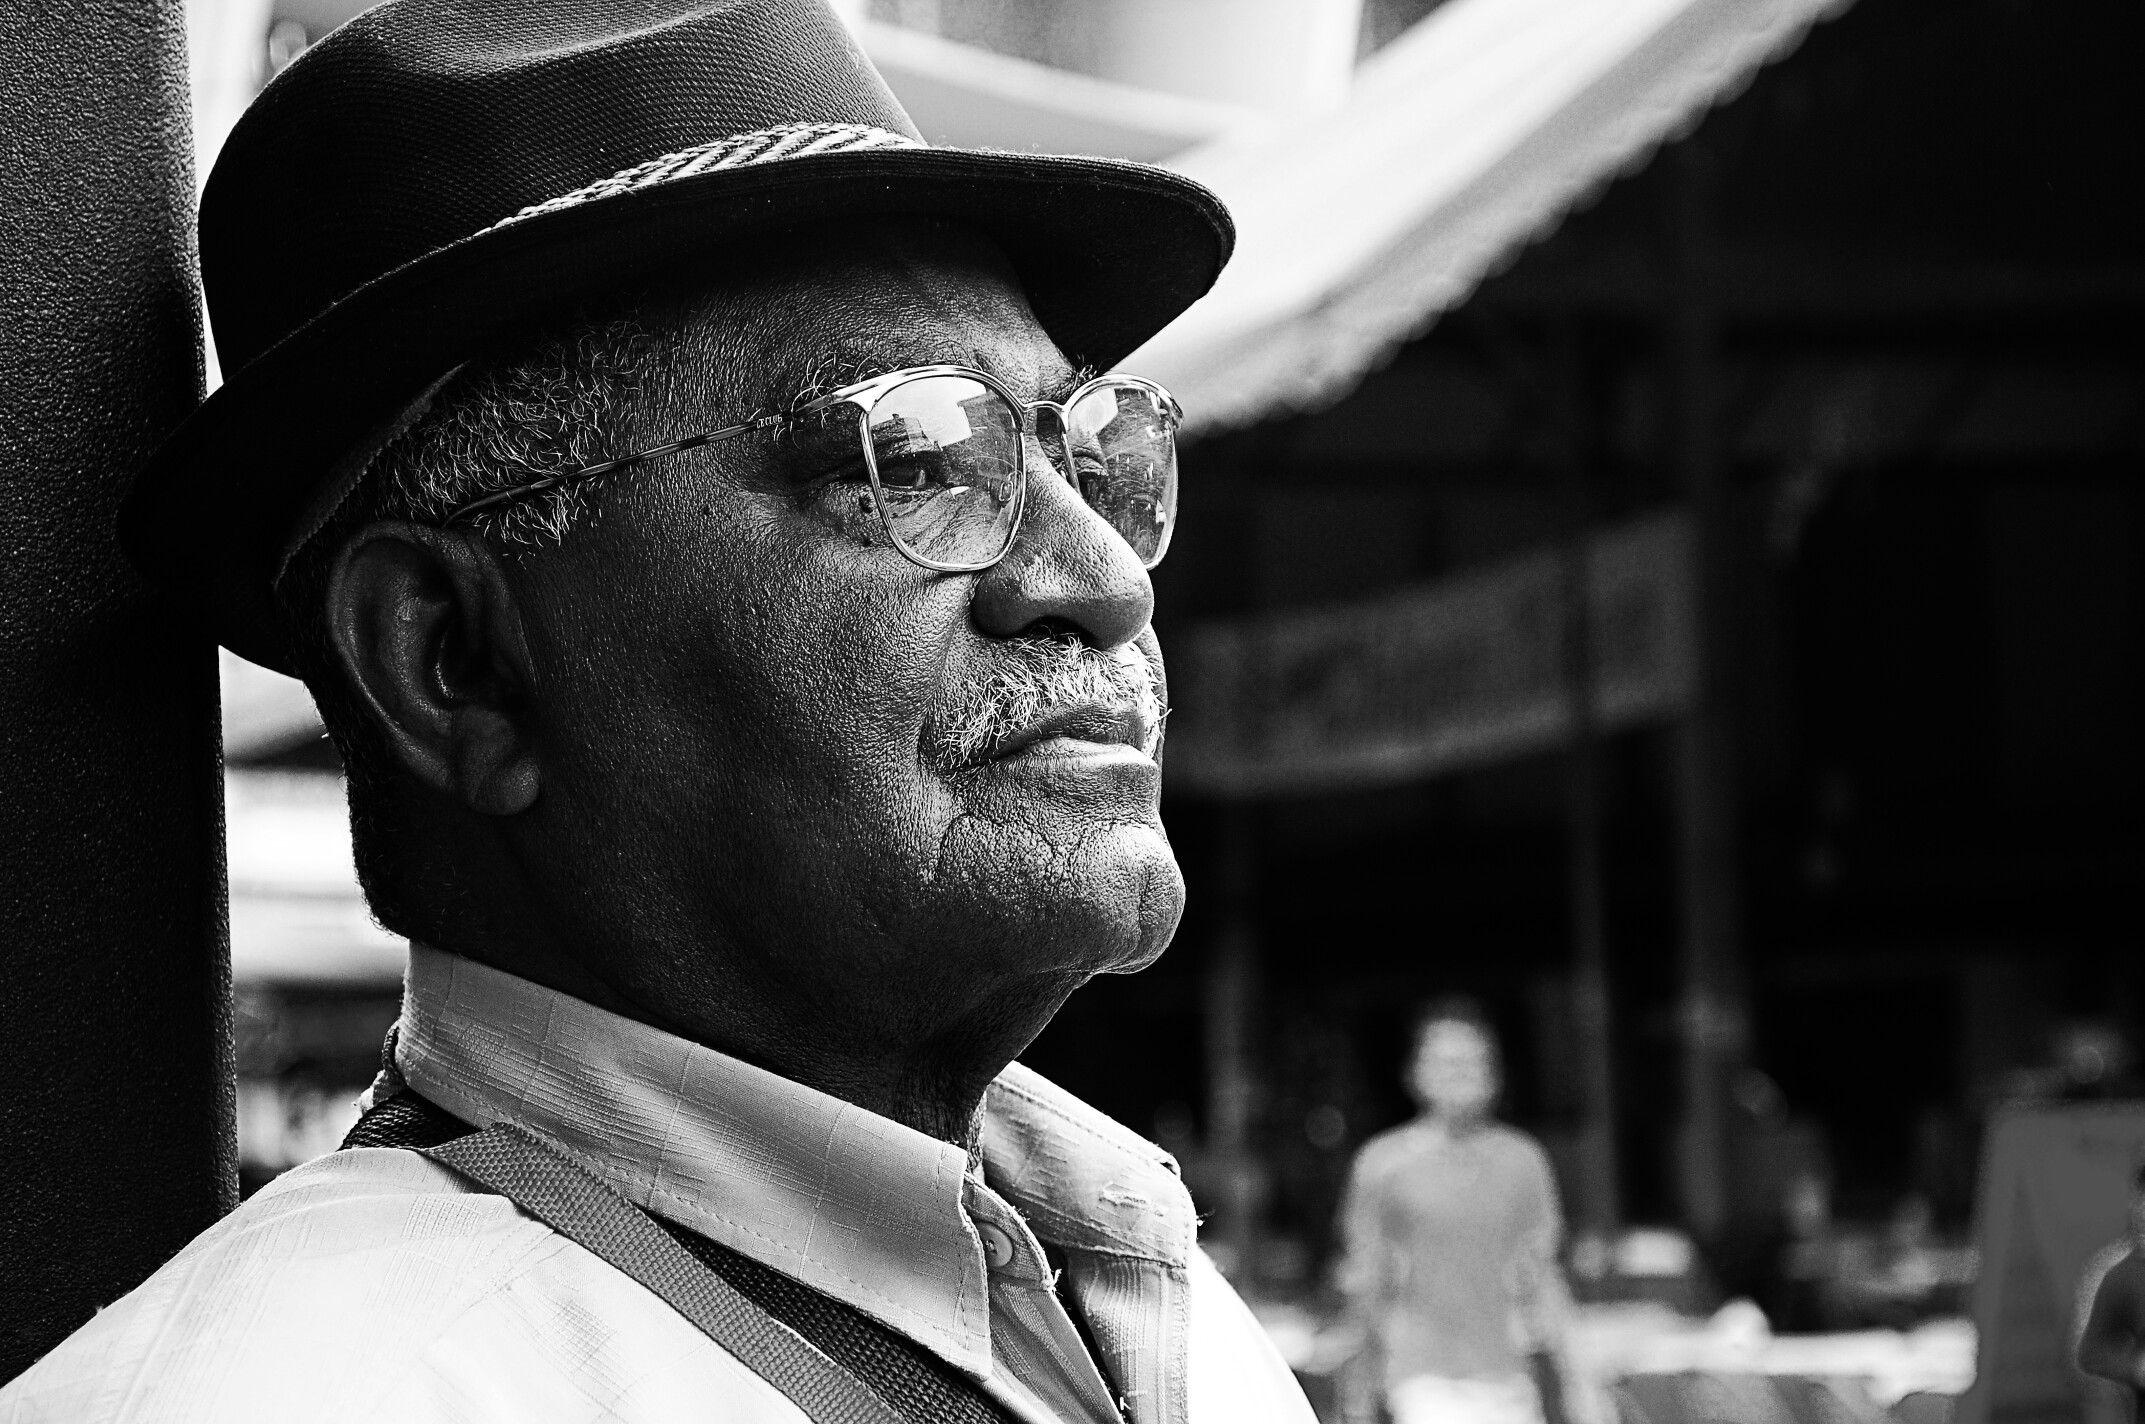 Velho homem negro -  foto : #fernandocorreafotografia